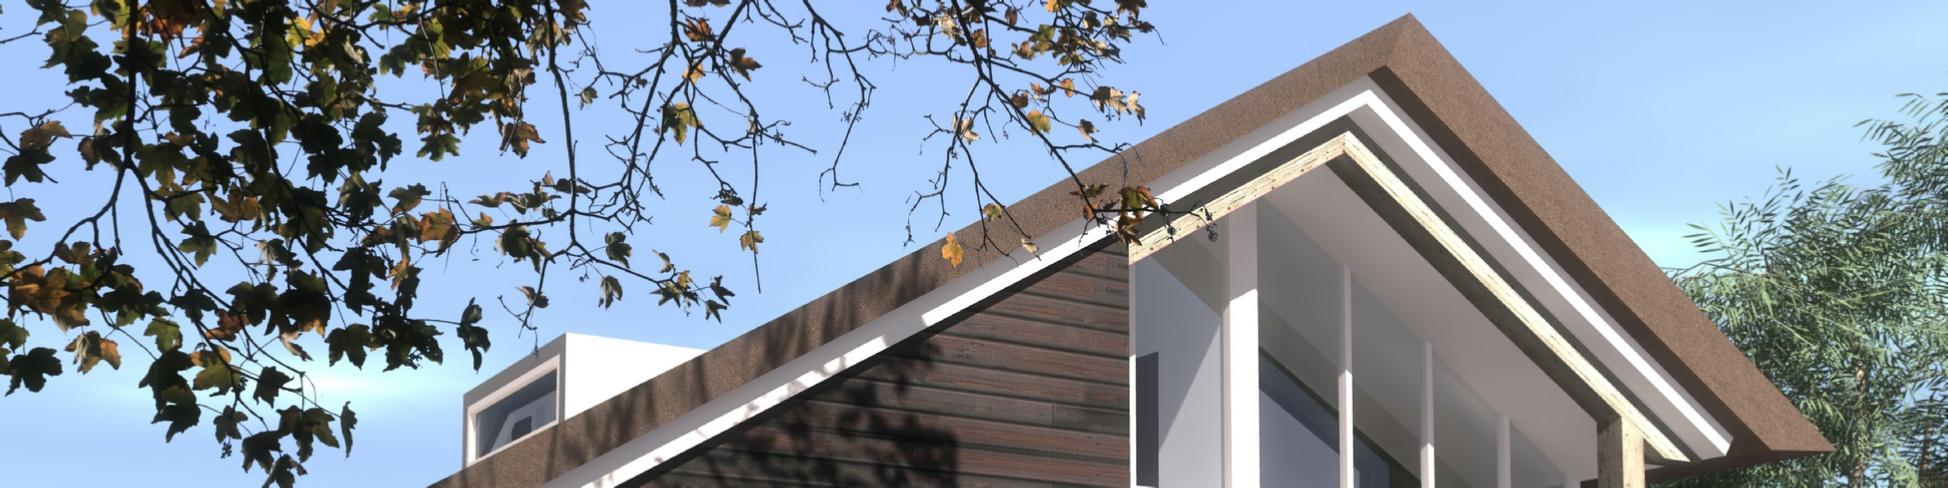 Recreatiewoning dak